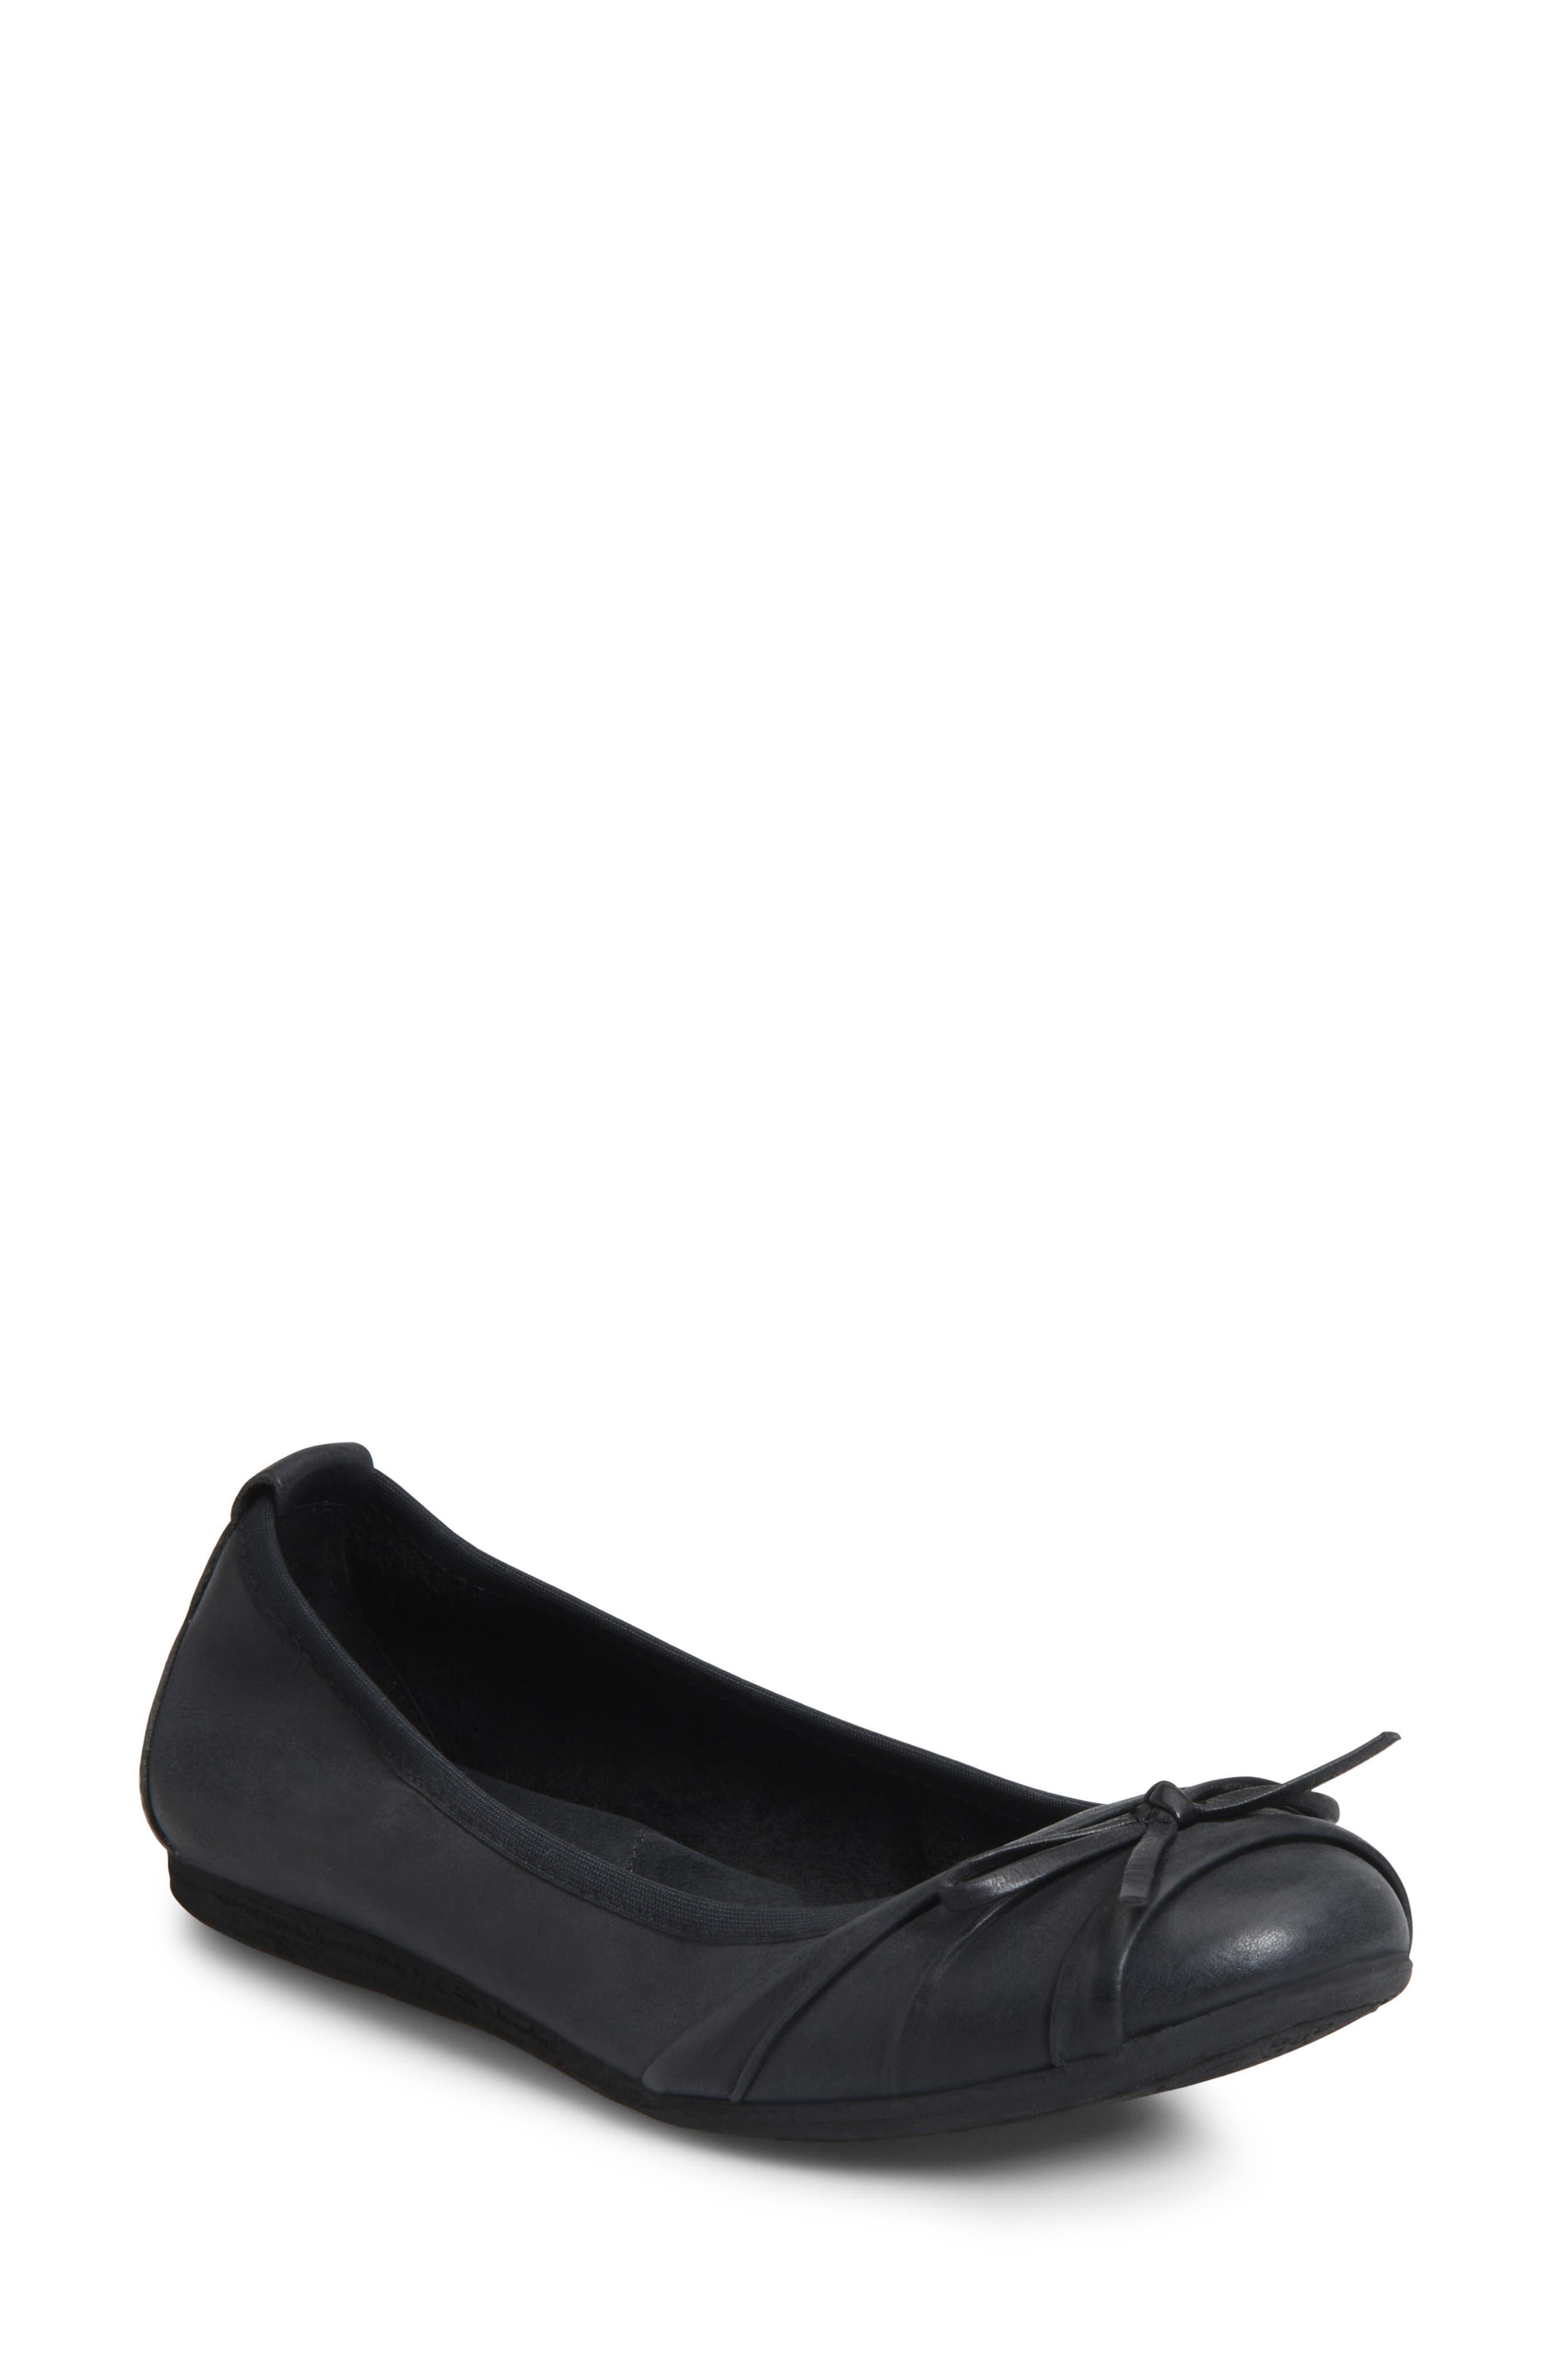 B?rn Chelan Ballet Flat, Black